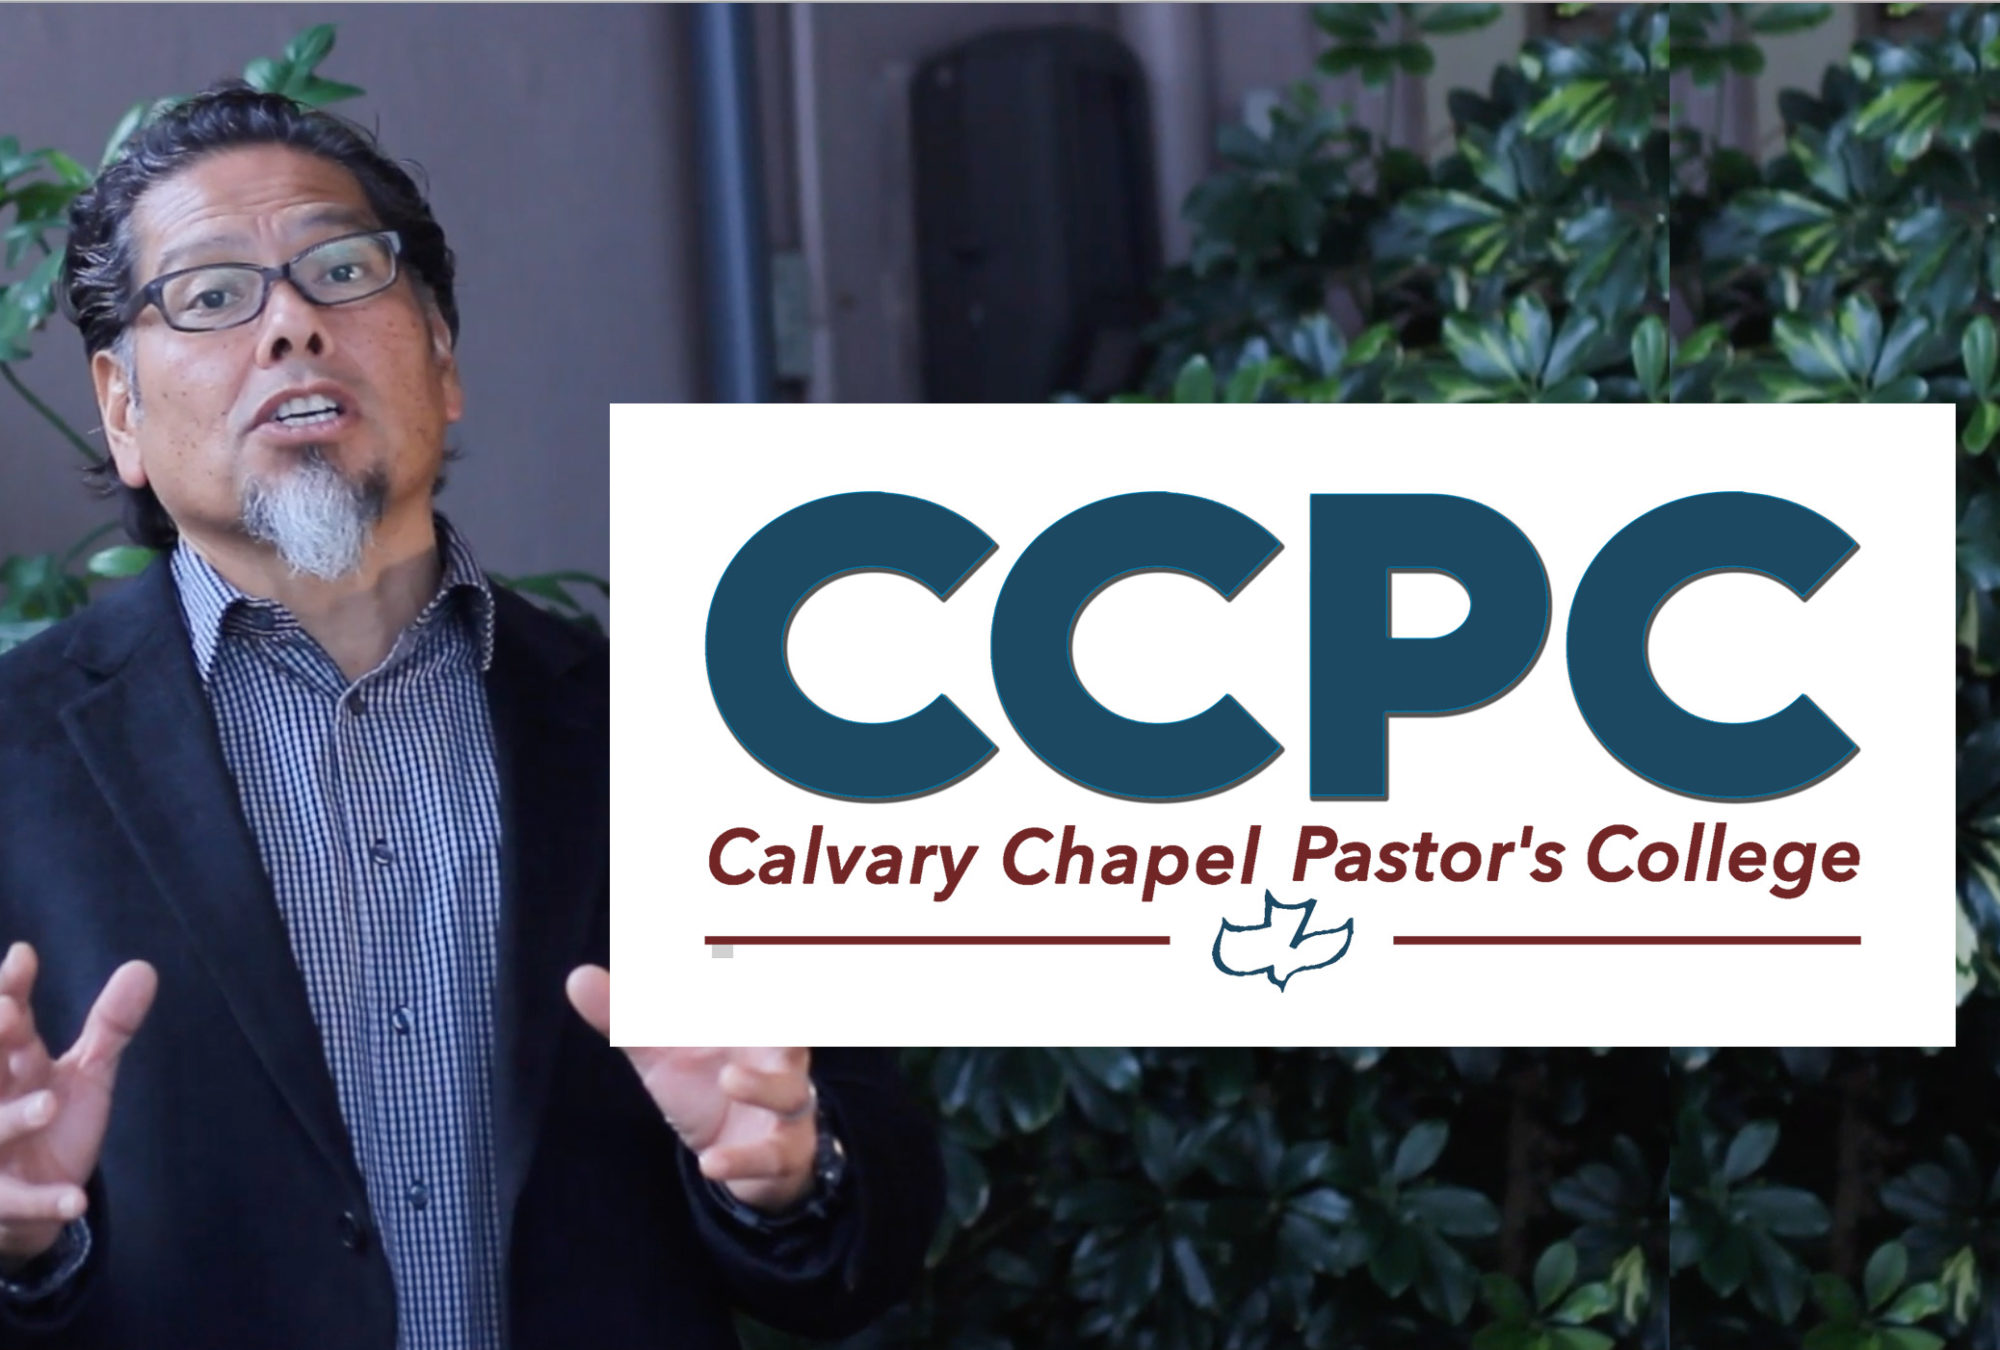 Calvary Chapel Pastor's College